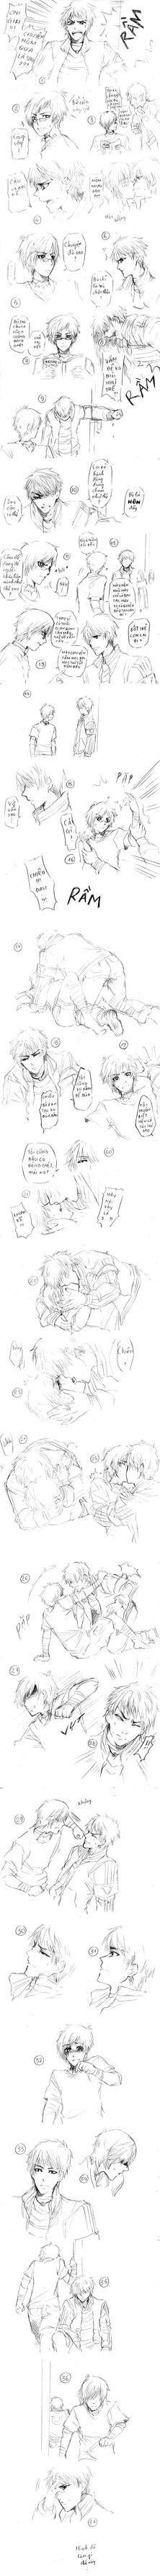 [VIE] - Misunderstood by TanoshiiBaka96